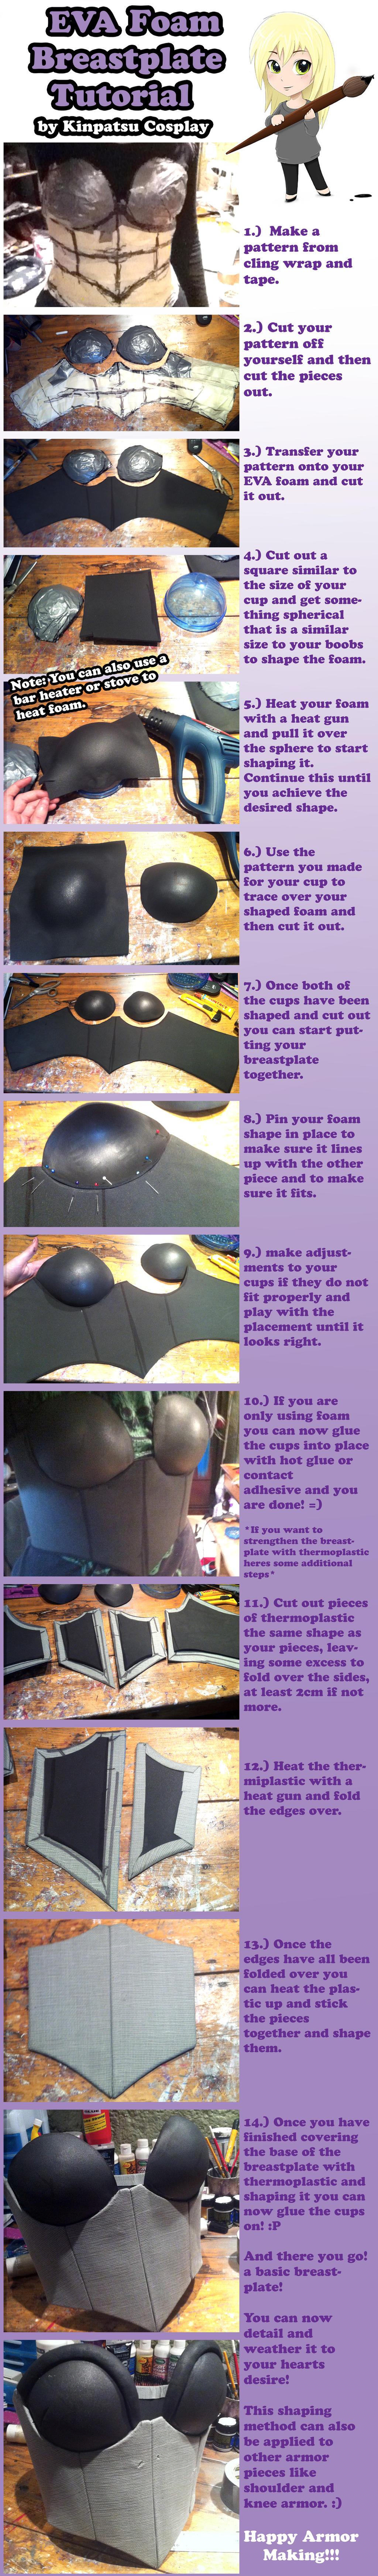 Eva Foam Breastplate Tutorial By Kinpatsu Cosplay On Deviantart